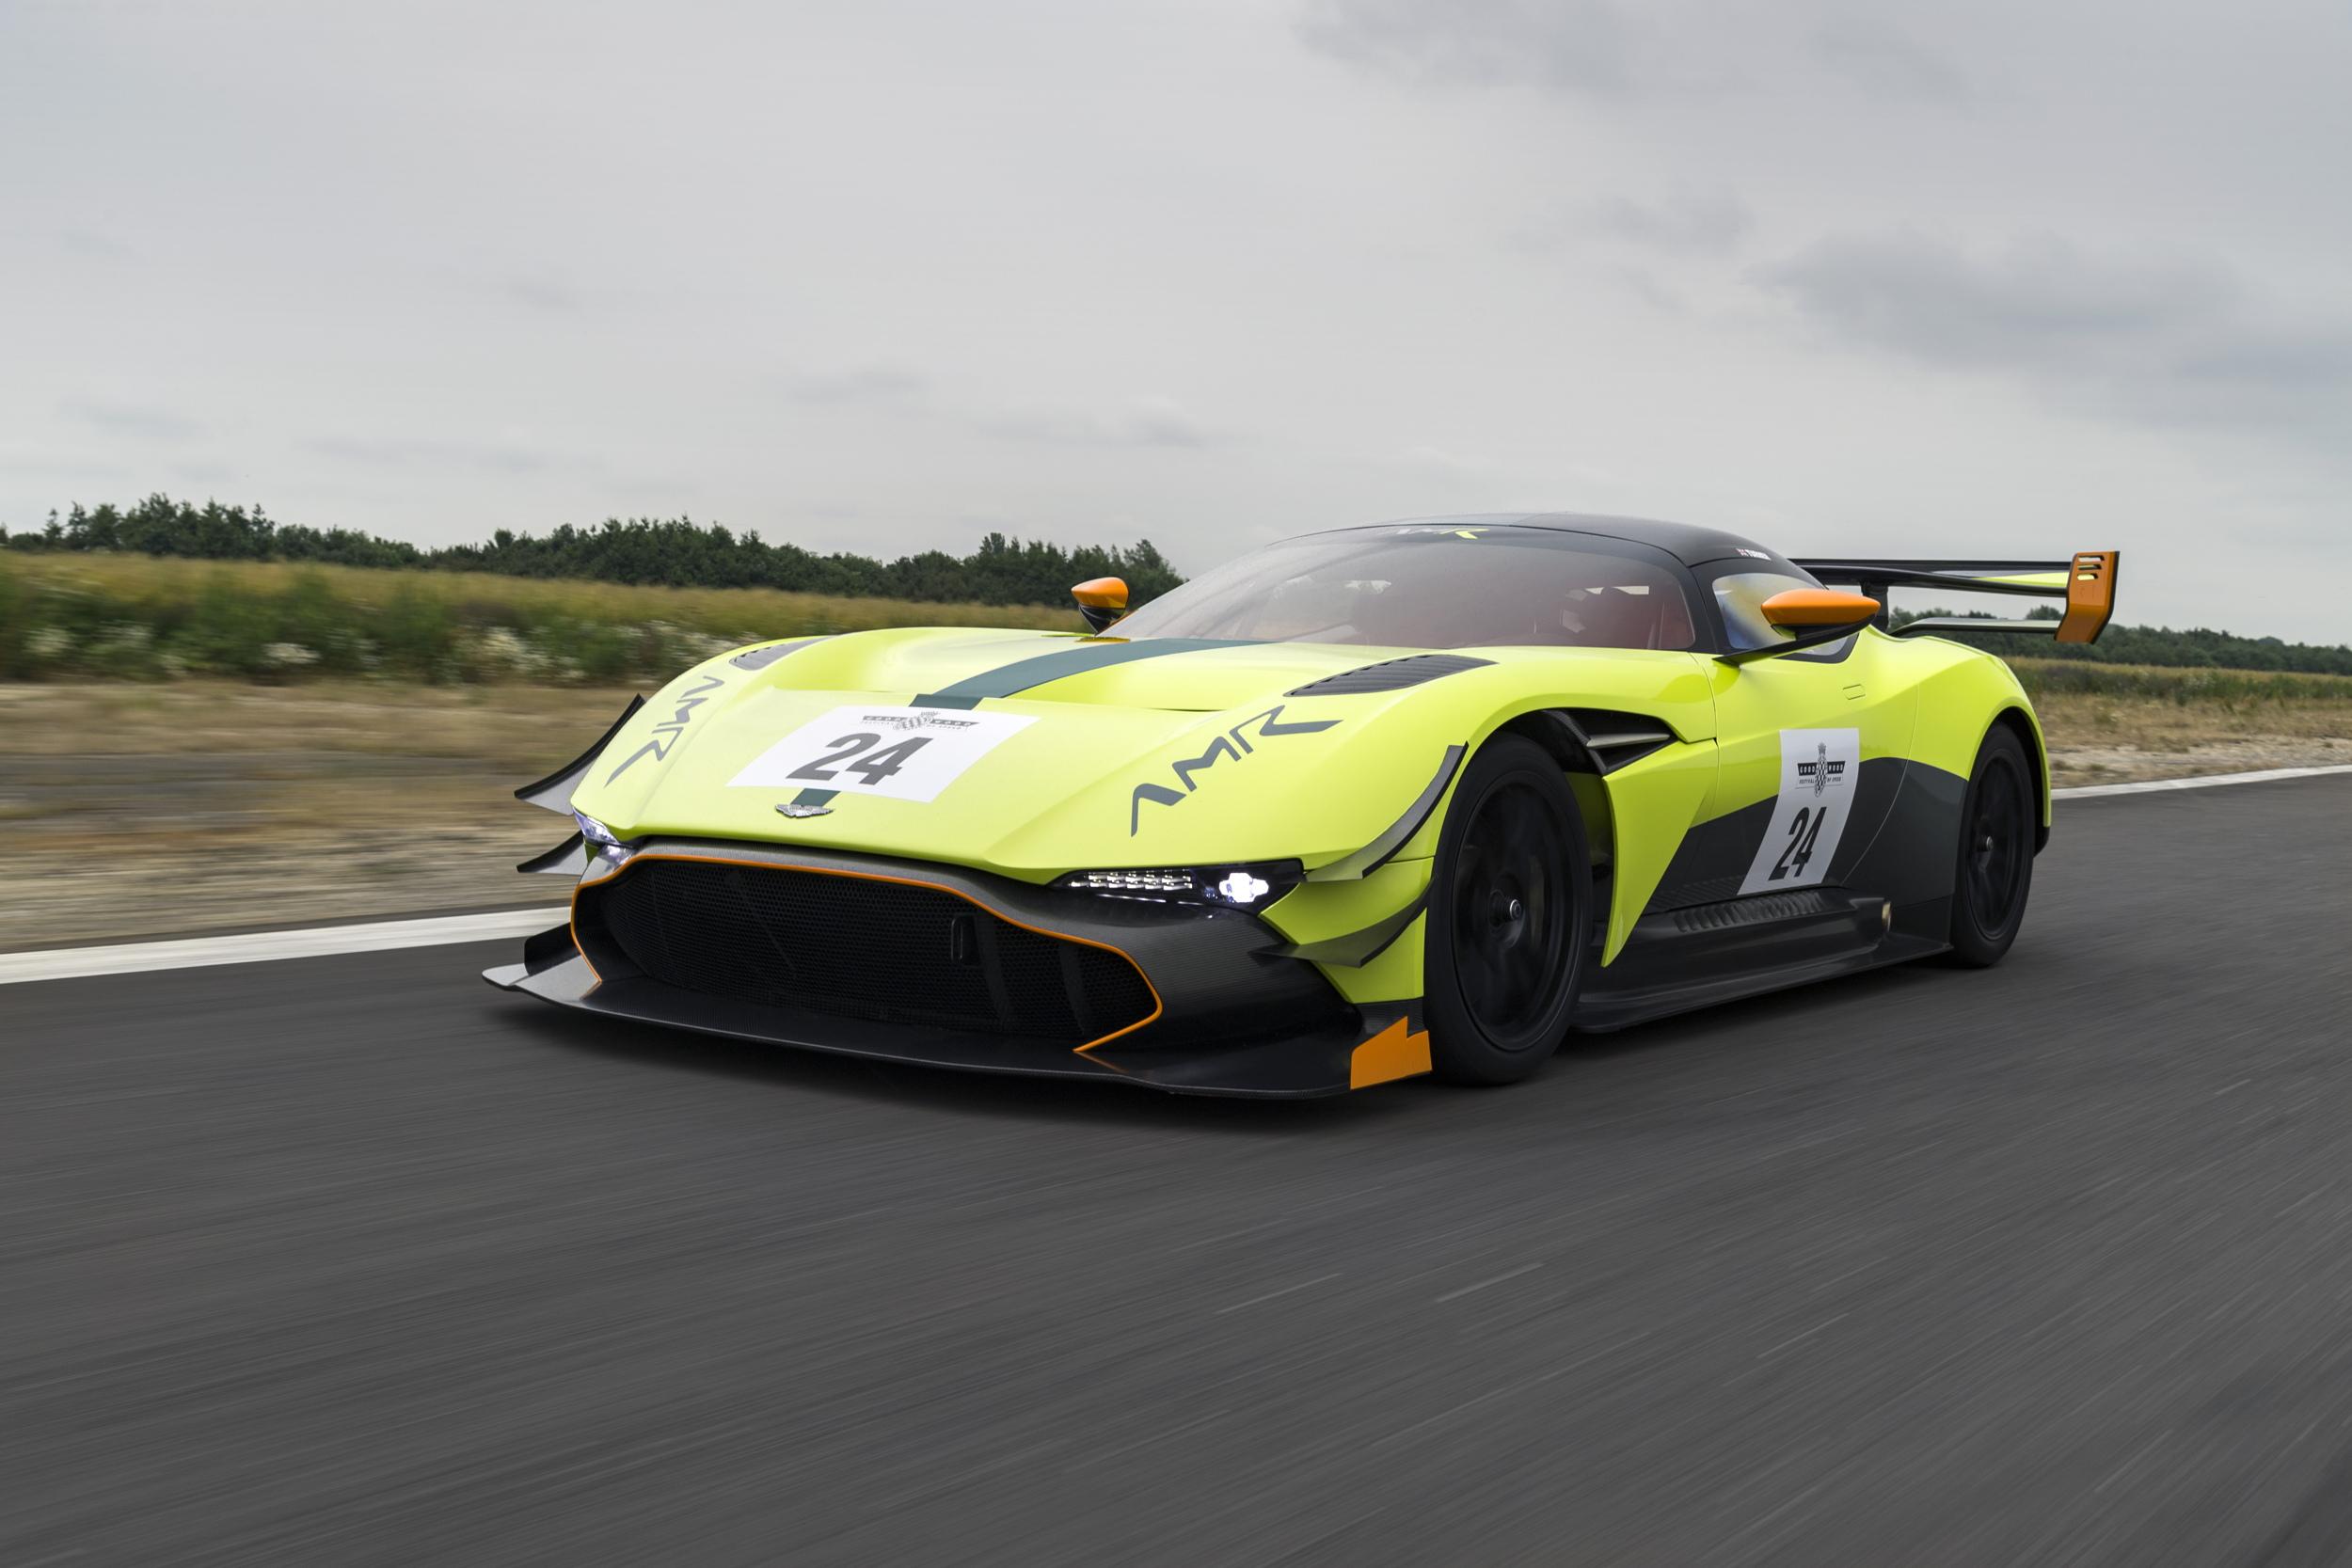 Aston Martin Vulcan AMR Pro front driving